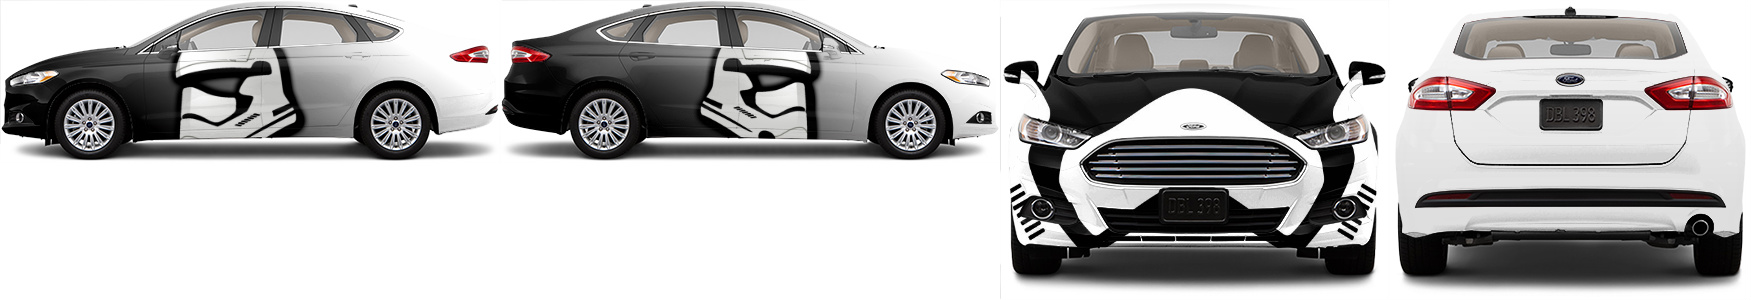 Storm Trooper Sedan Wrap Designed By Cody Davis Design